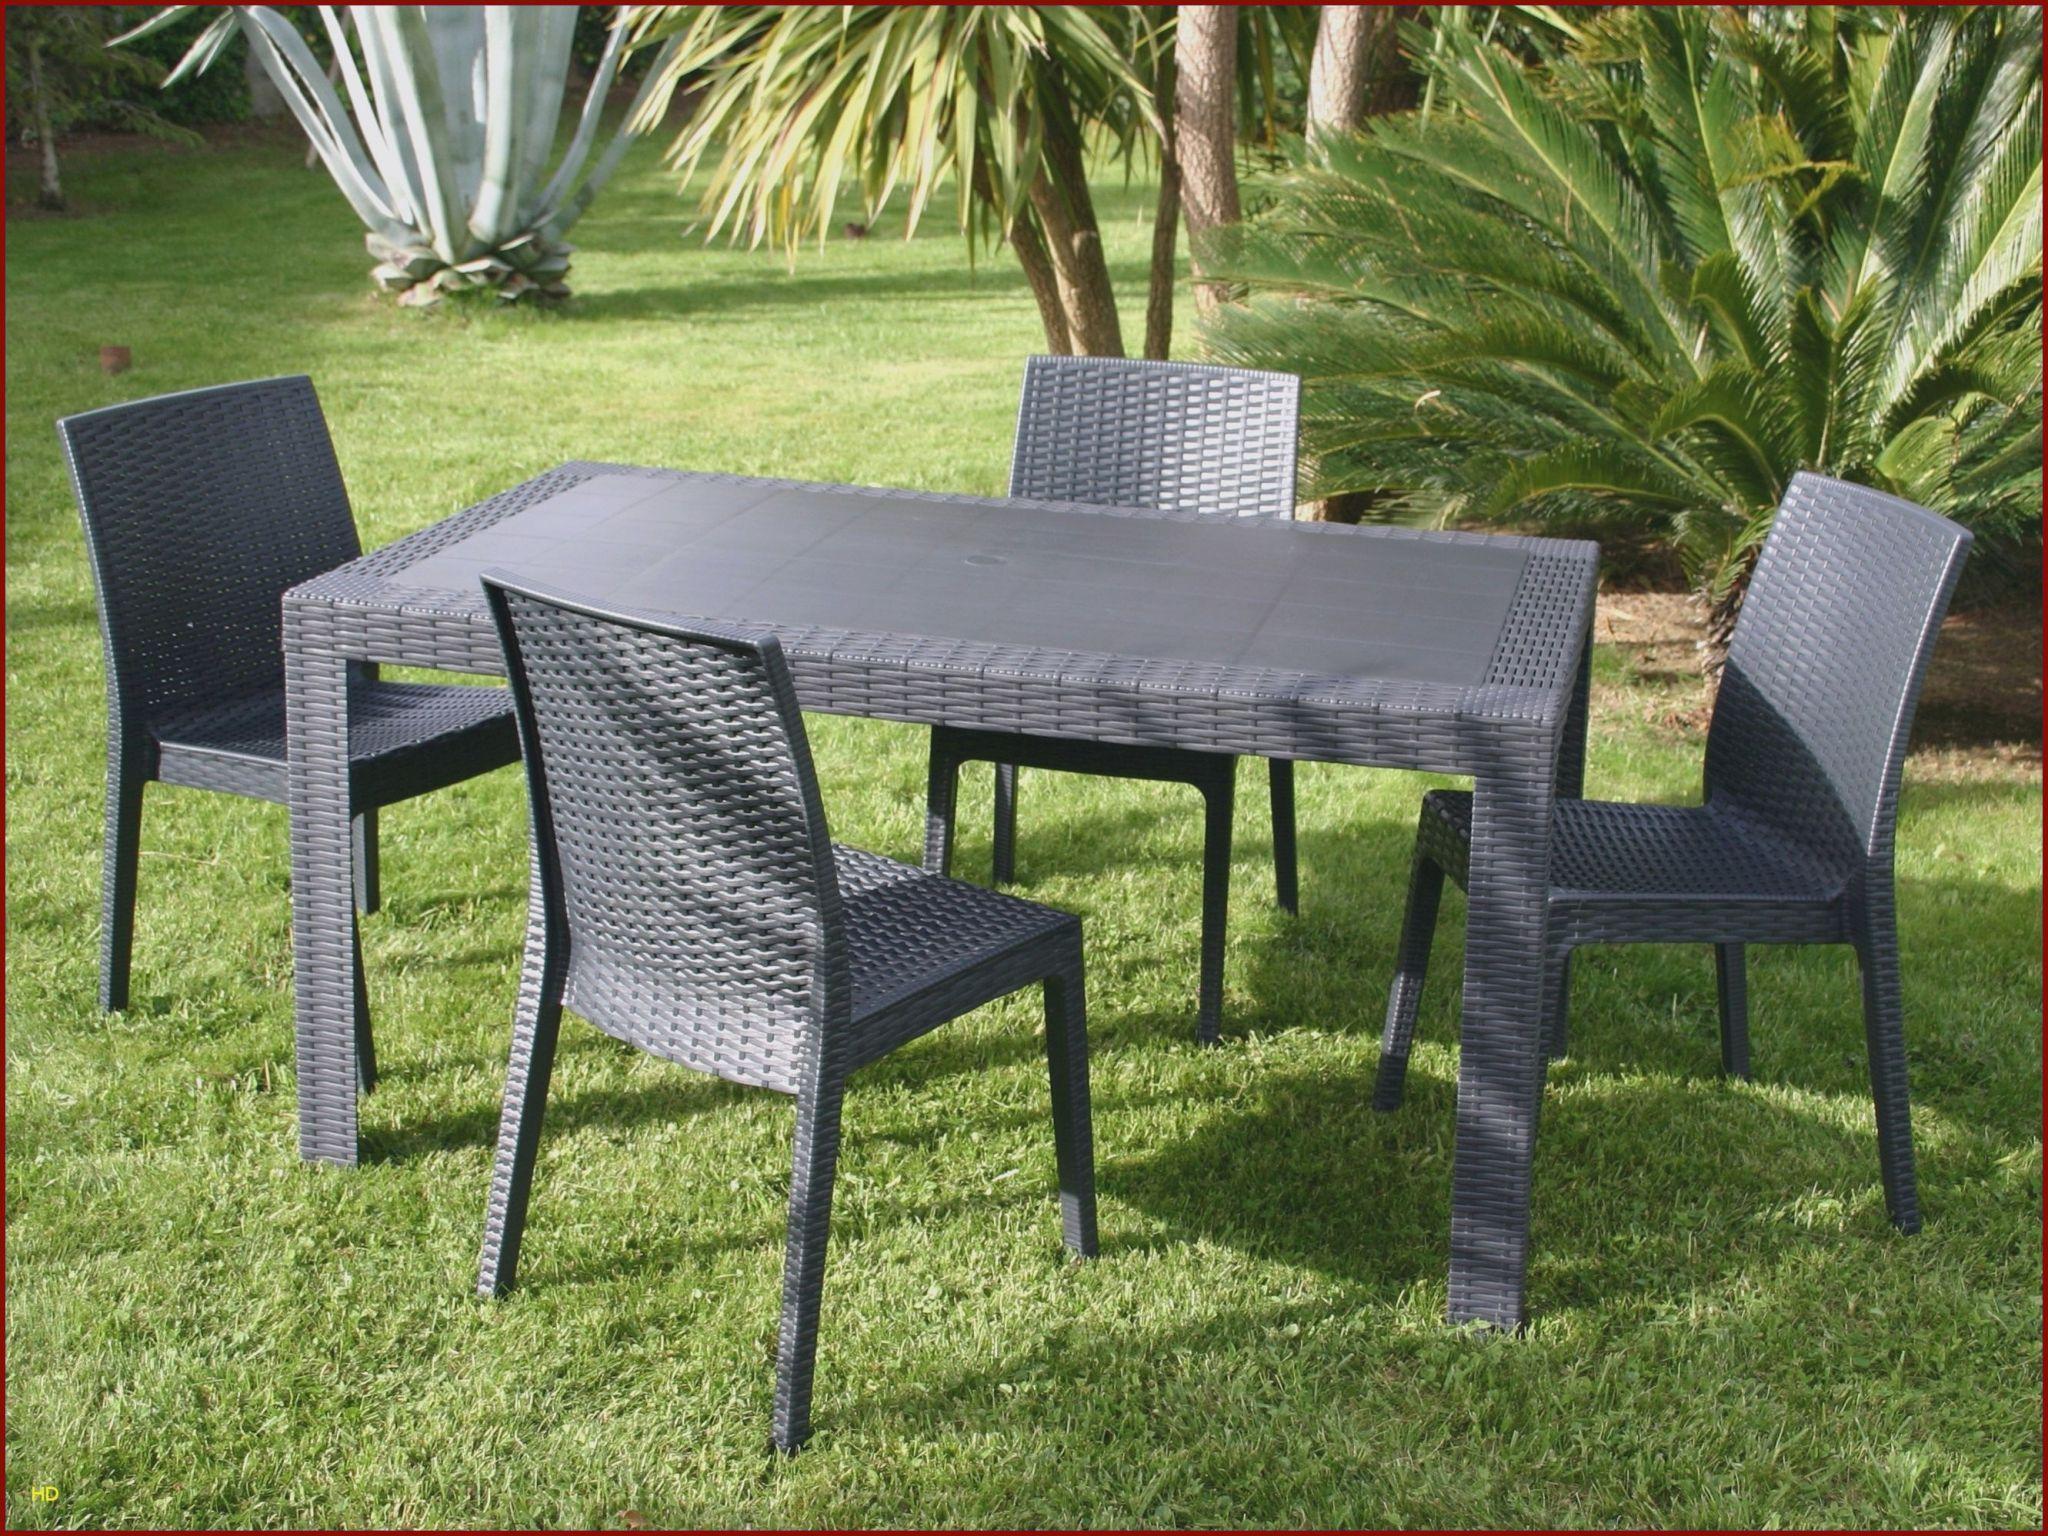 Table De Jardin Bois Pliante Best Of Chaises Luxe Chaise Ice 0d Table Jardin Resine Lovely Of 40 Frais Table De Jardin Bois Pliante